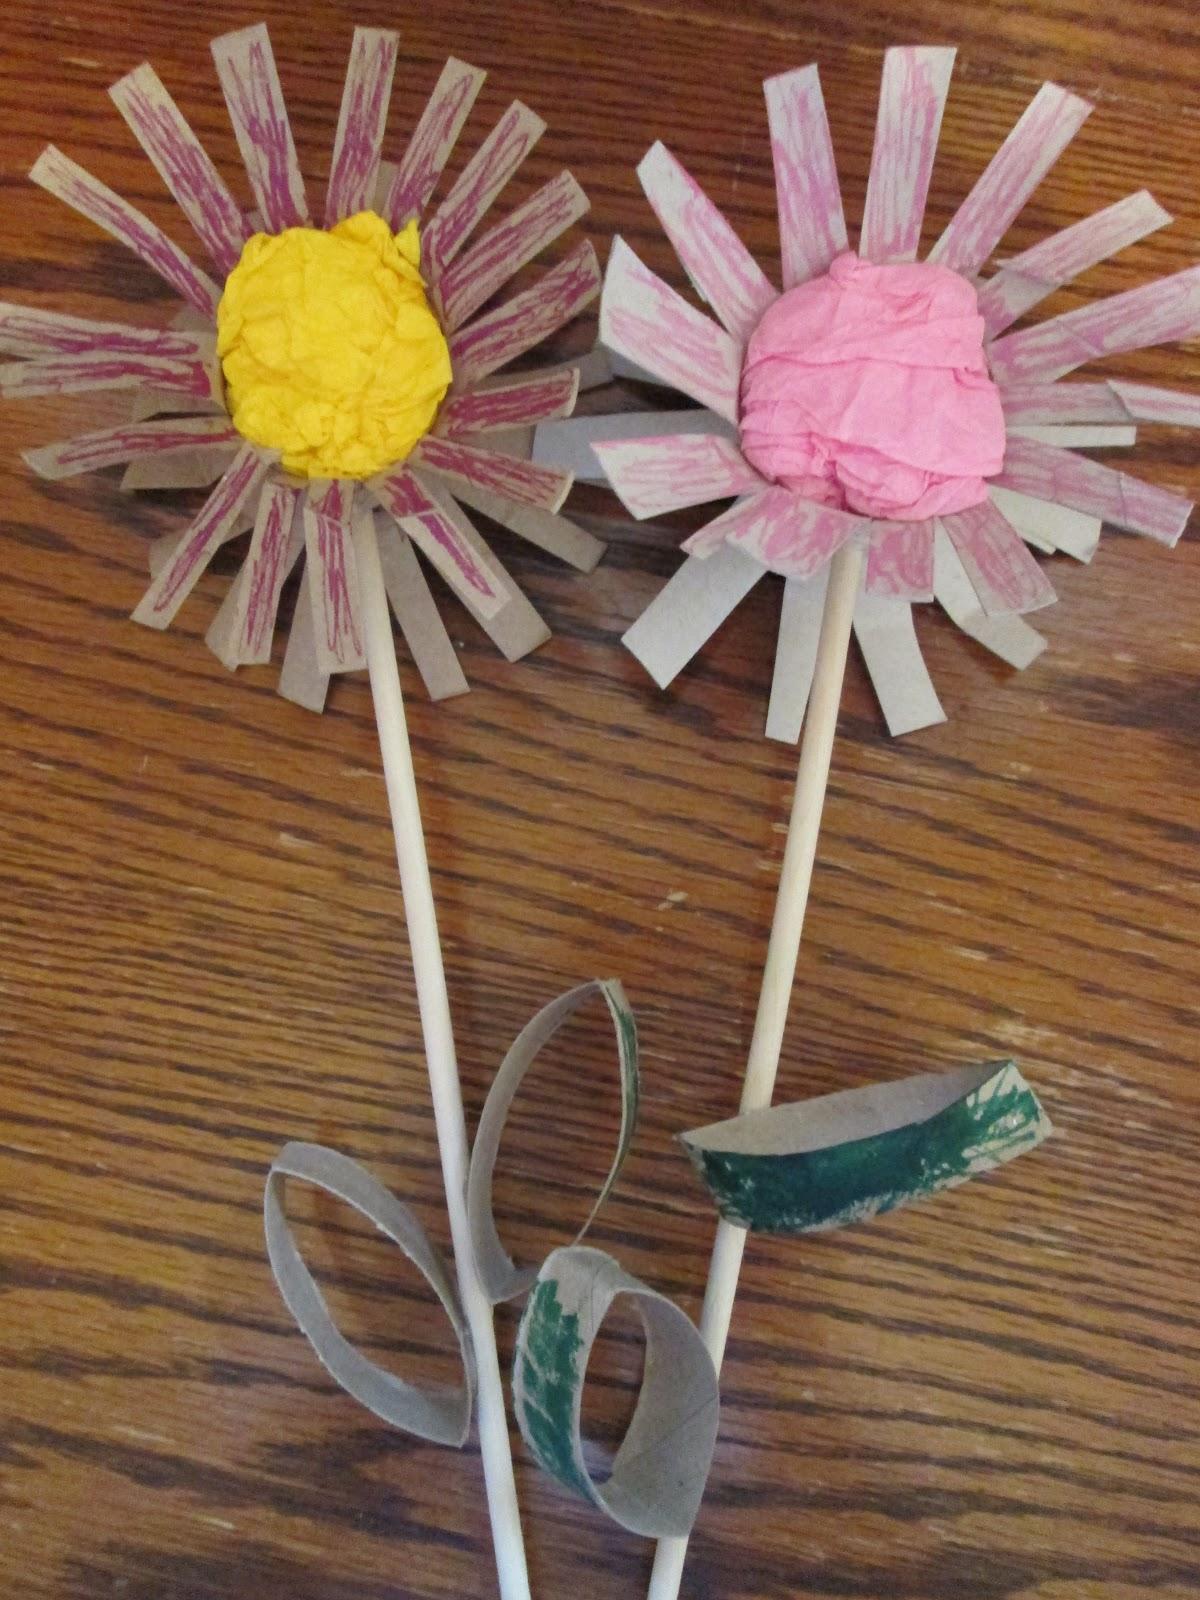 Walk in the sunshine cardboard tube flowers for Cardboard tube flowers